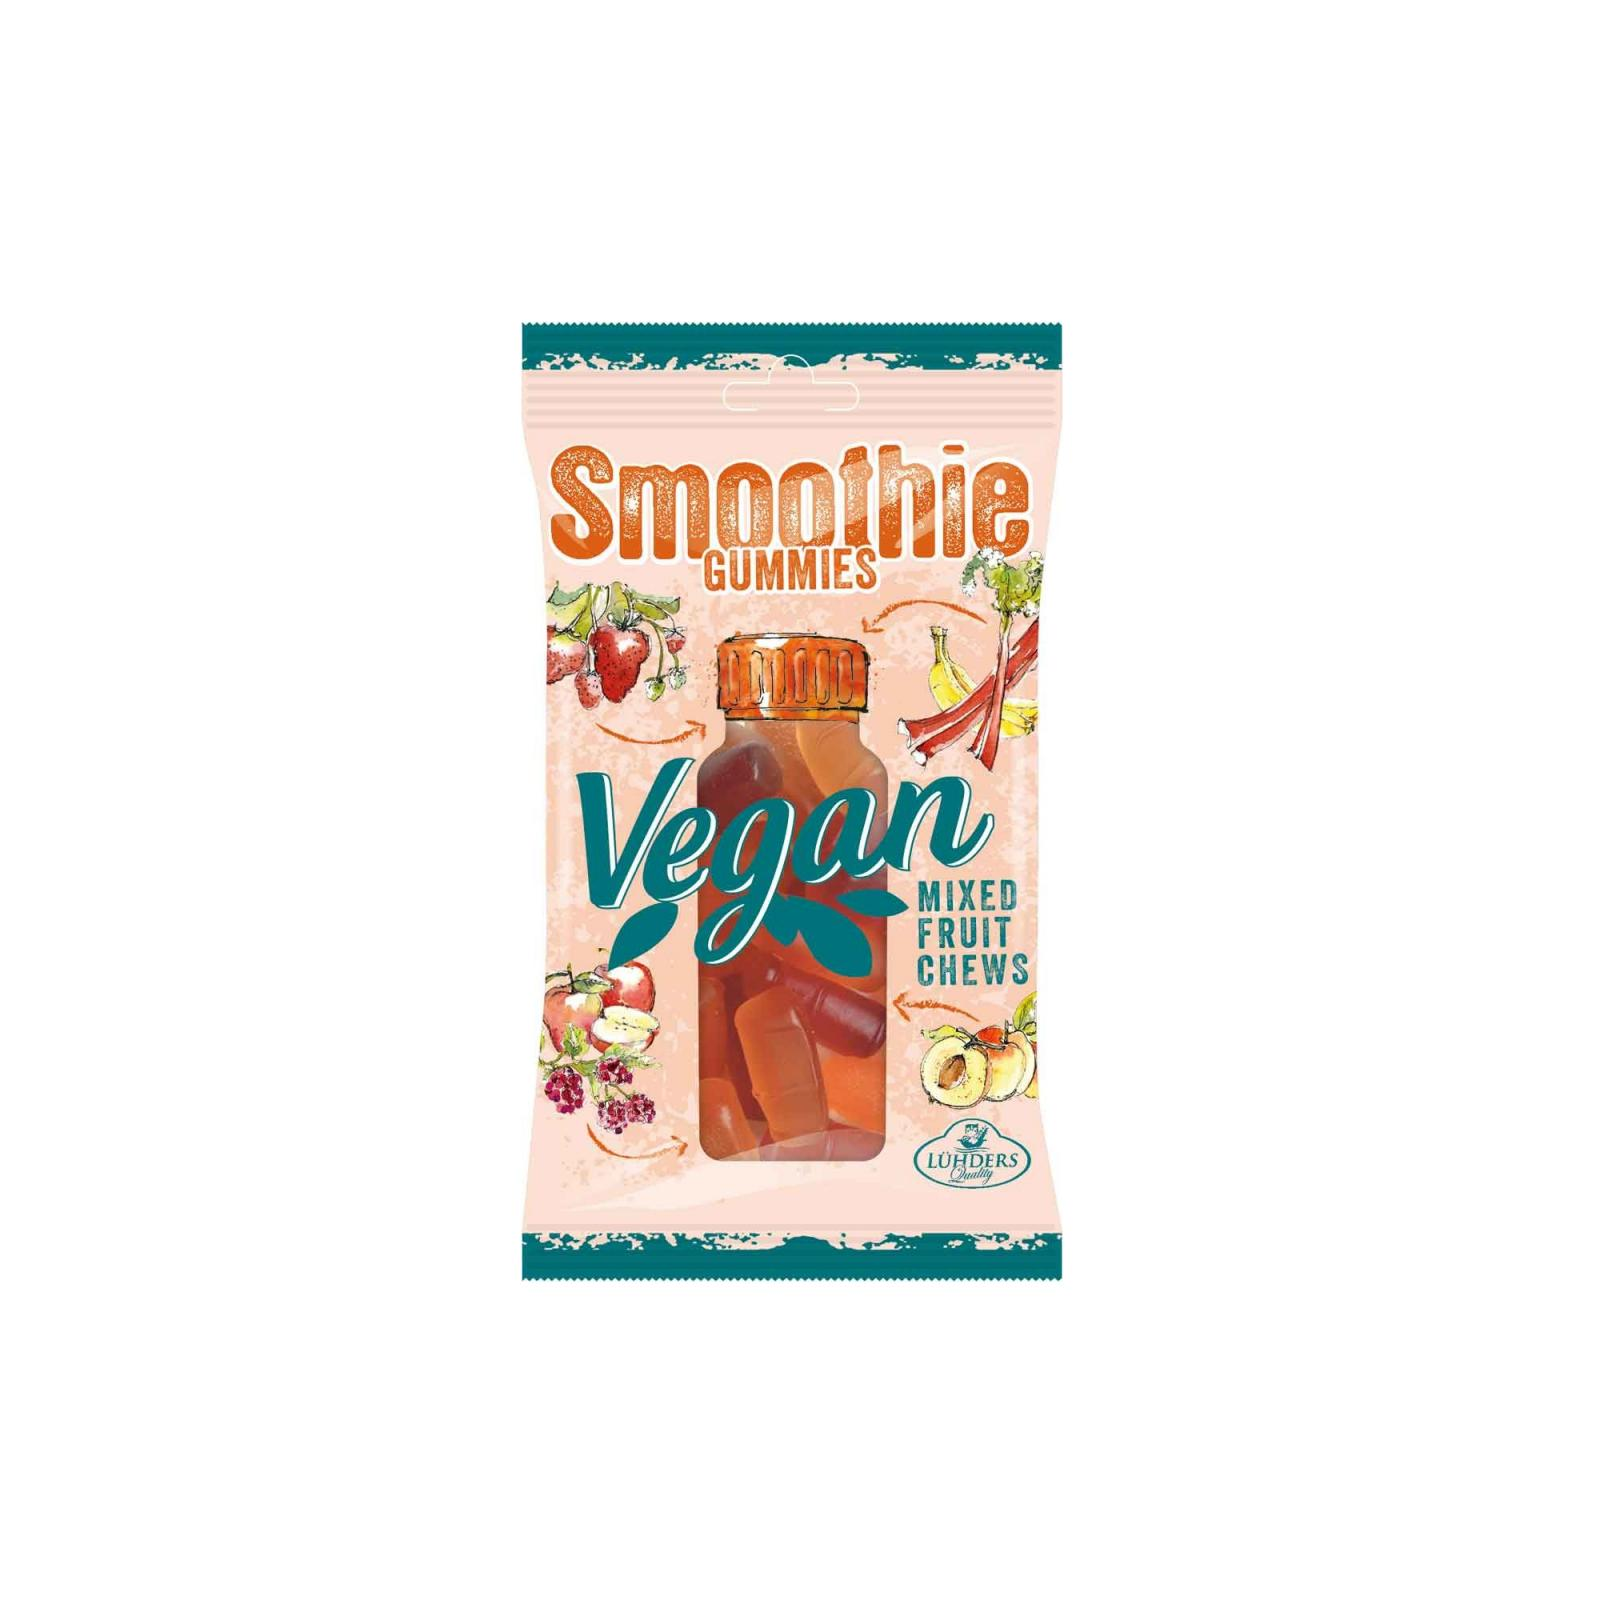 Luehders Smoothie želé ovocné bonbony 80g, jablko, broskev, malina, banán, jahoda, rebarbora